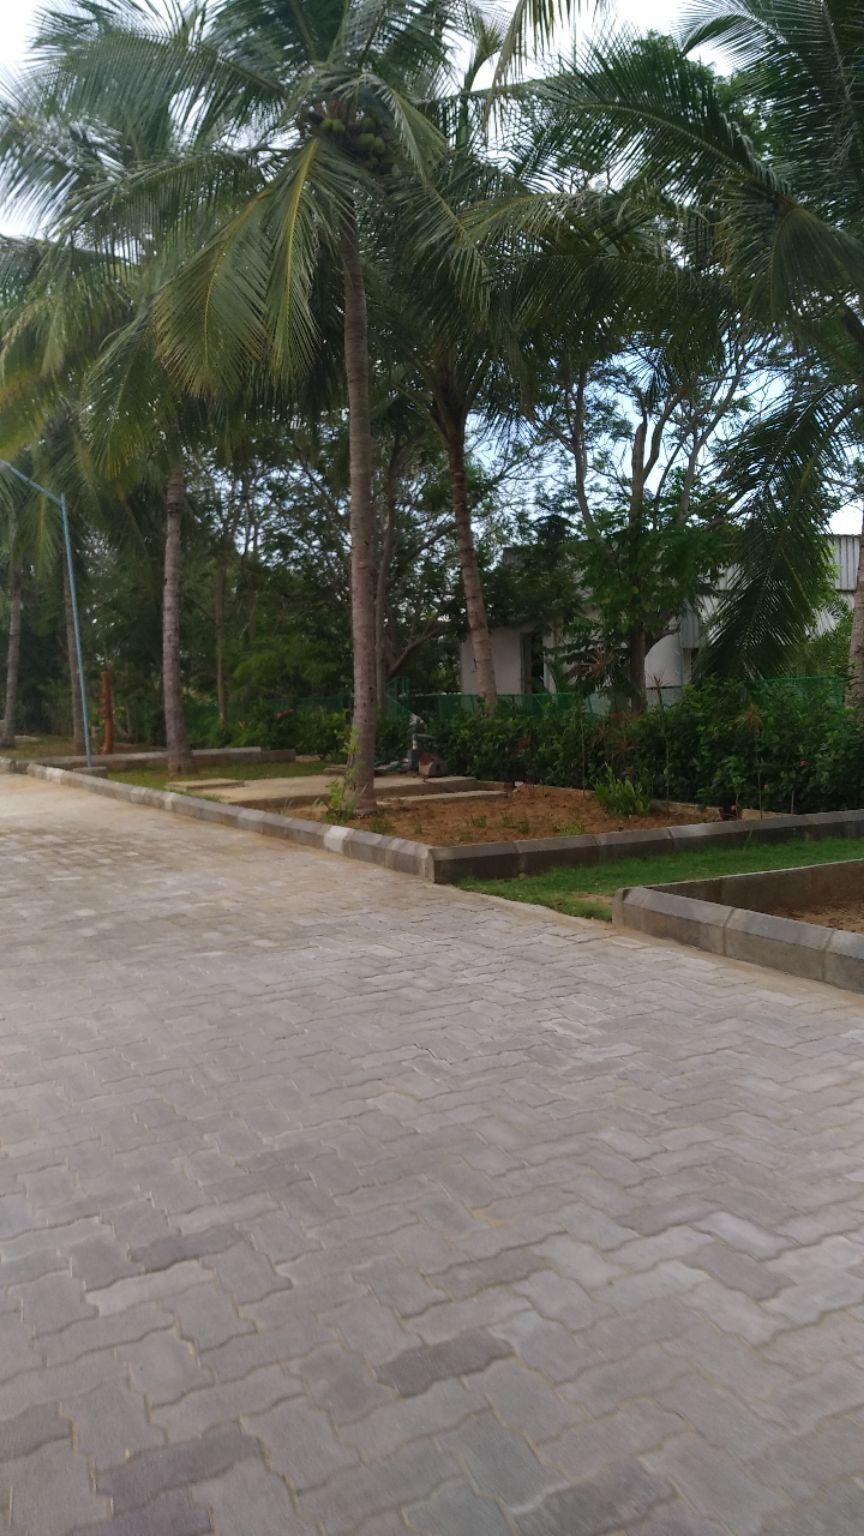 Photo of Mahabalipuram By Pankti Shah